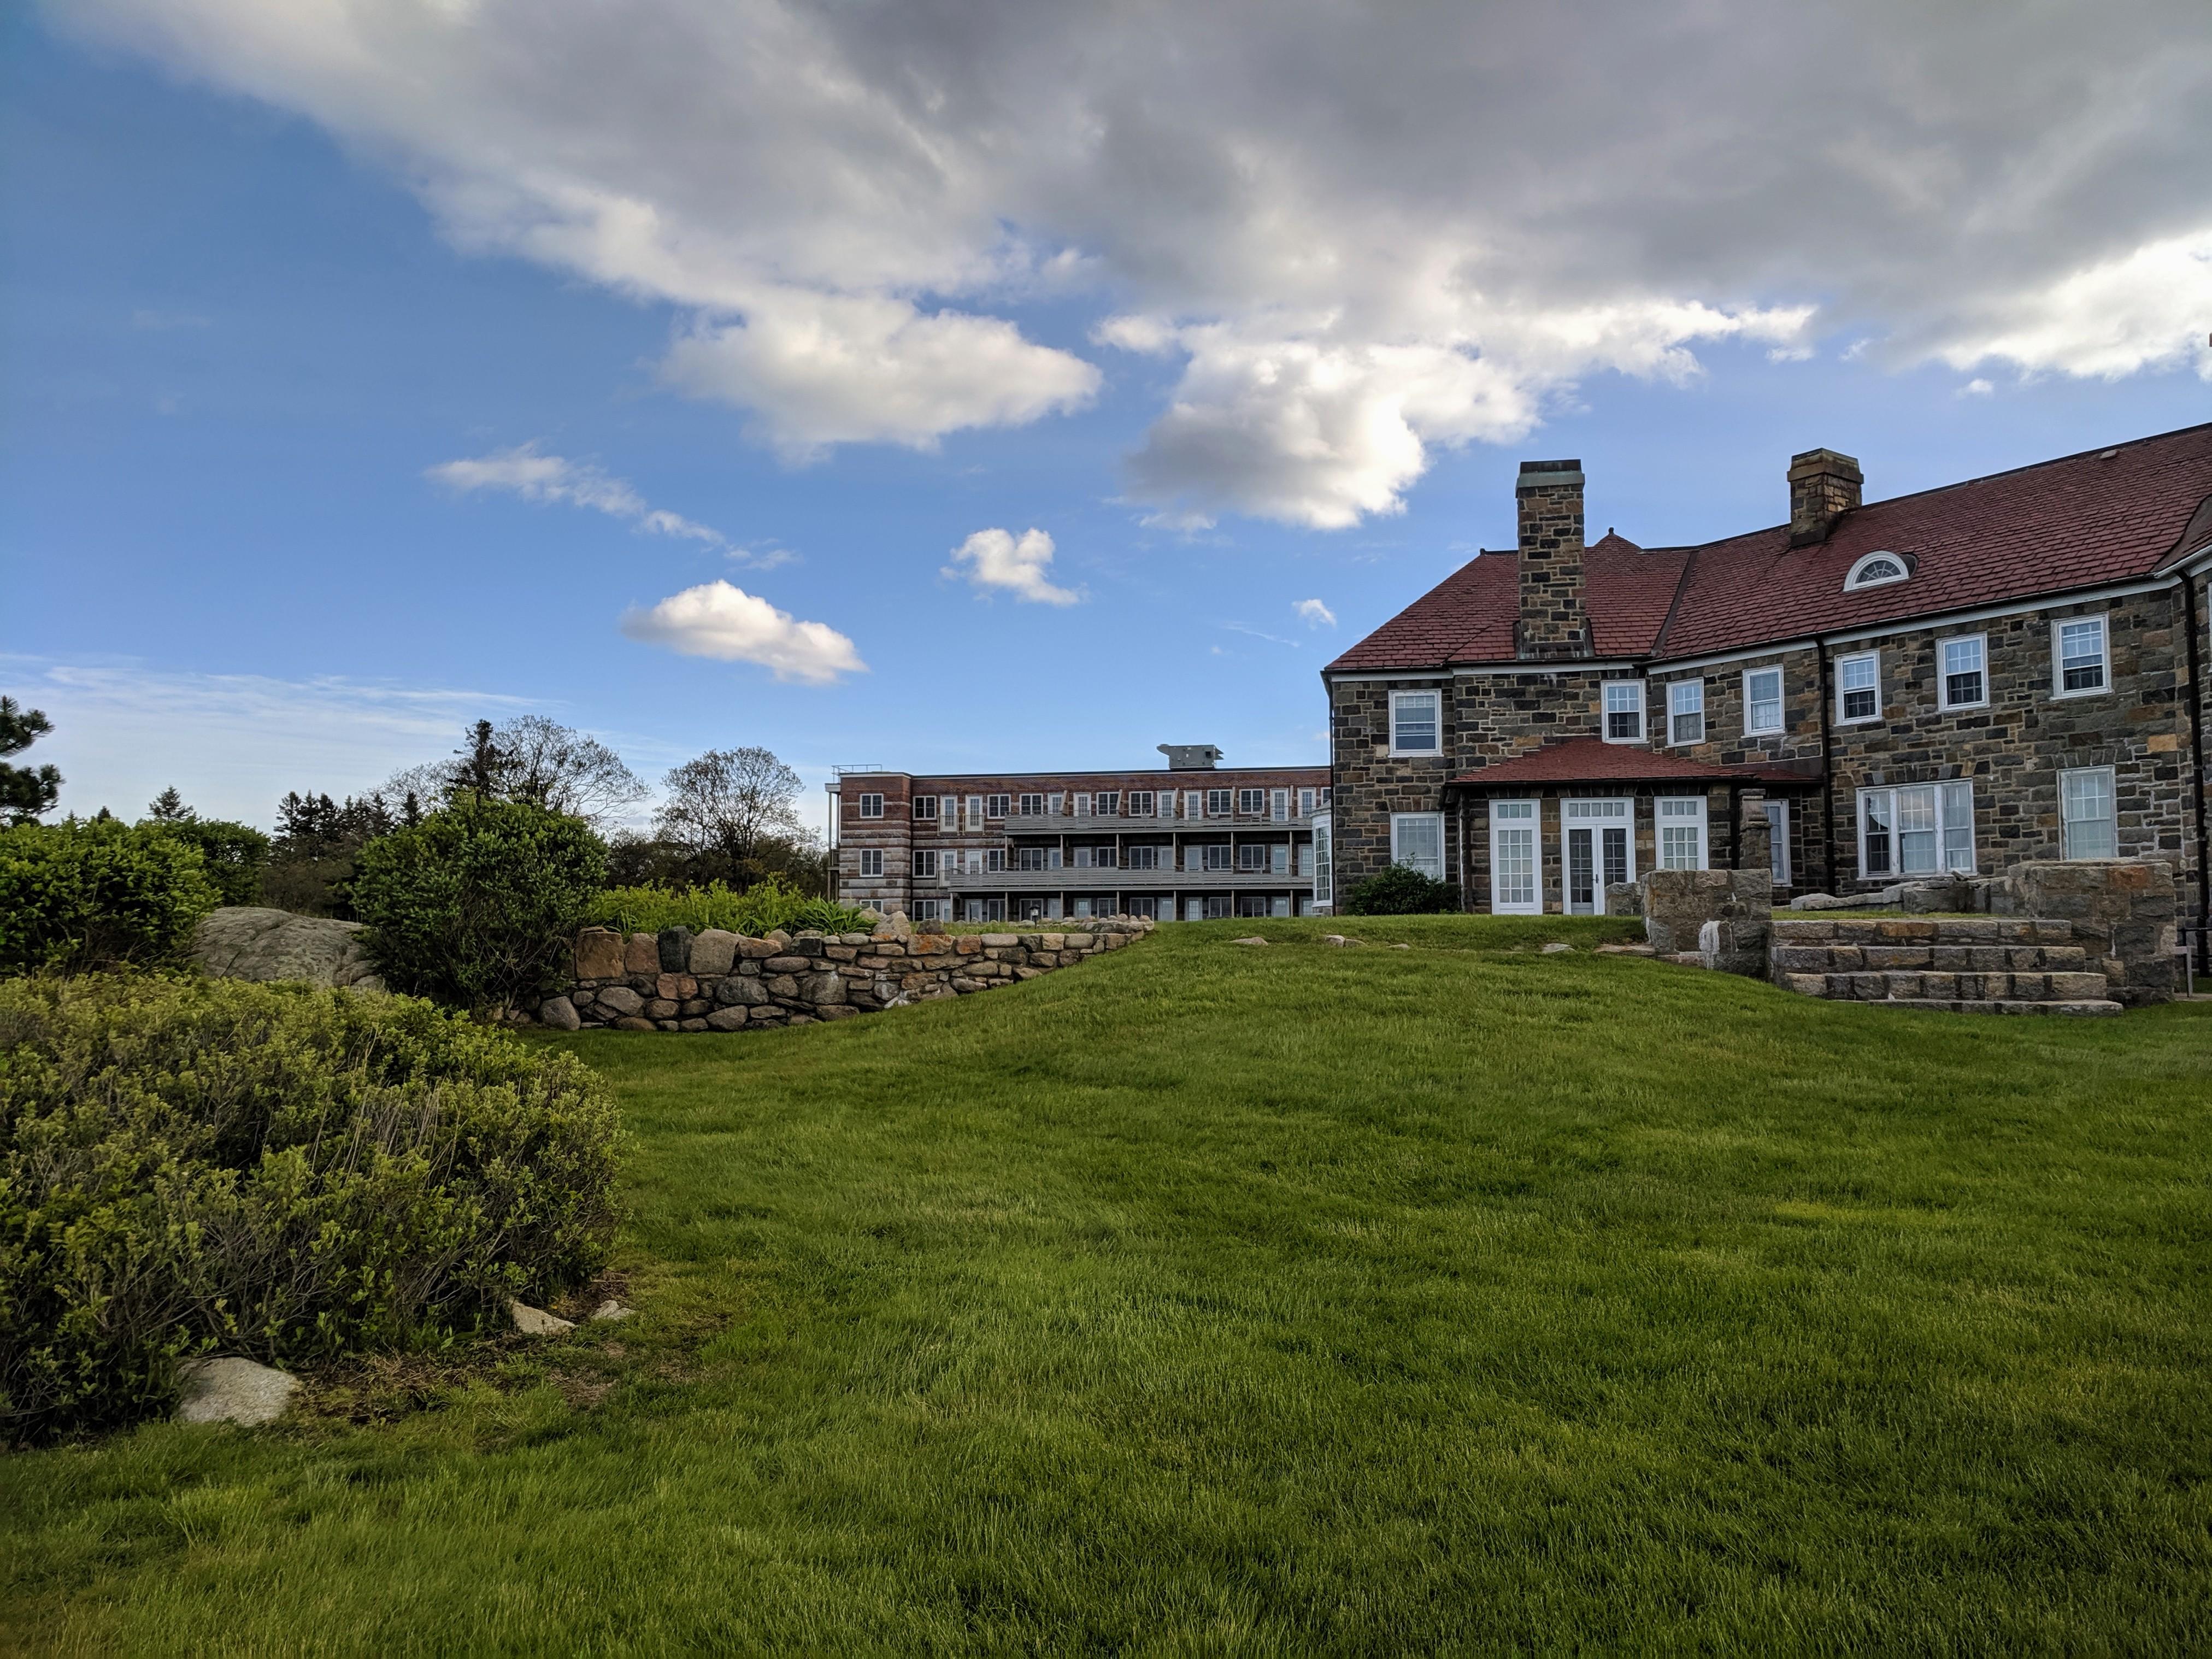 new dormitory construction circa 2017 altered Donald J Monell addition_Eastern Point Retreat_Gloucester Massachusetts_20190521_© c ryan.jpg